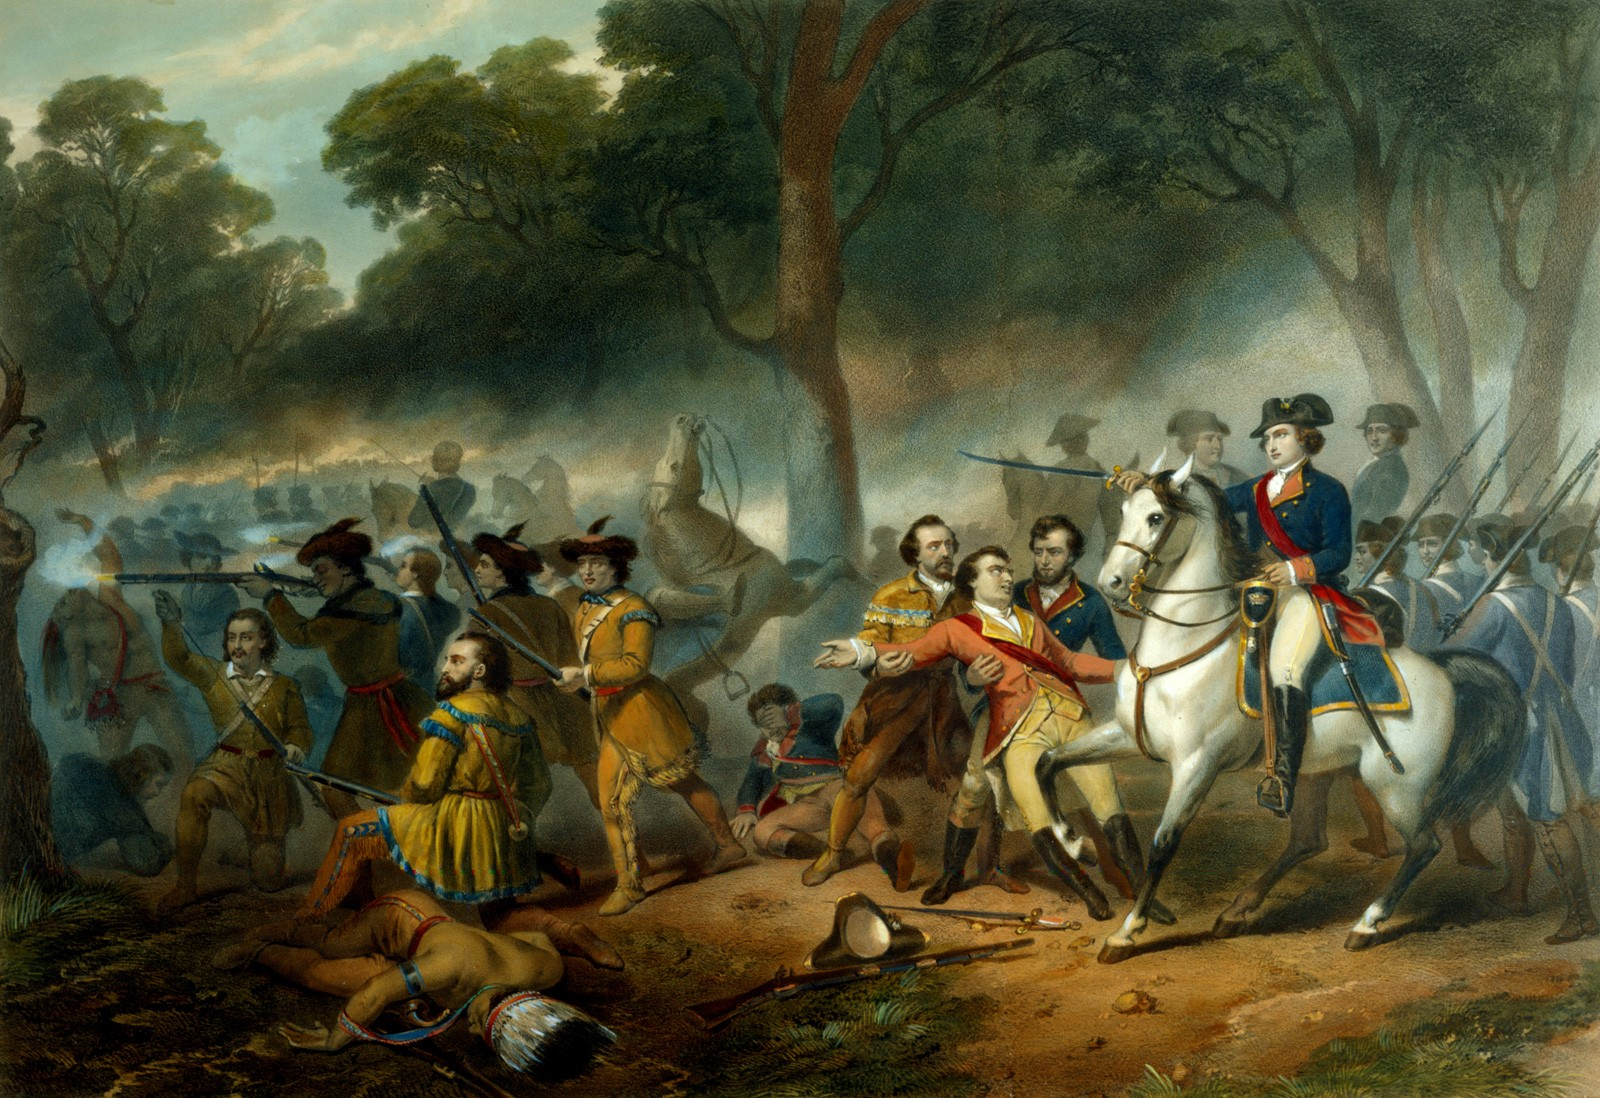 george washington · george washington s mount vernon washington the ier battle of the monongahela 9 1755